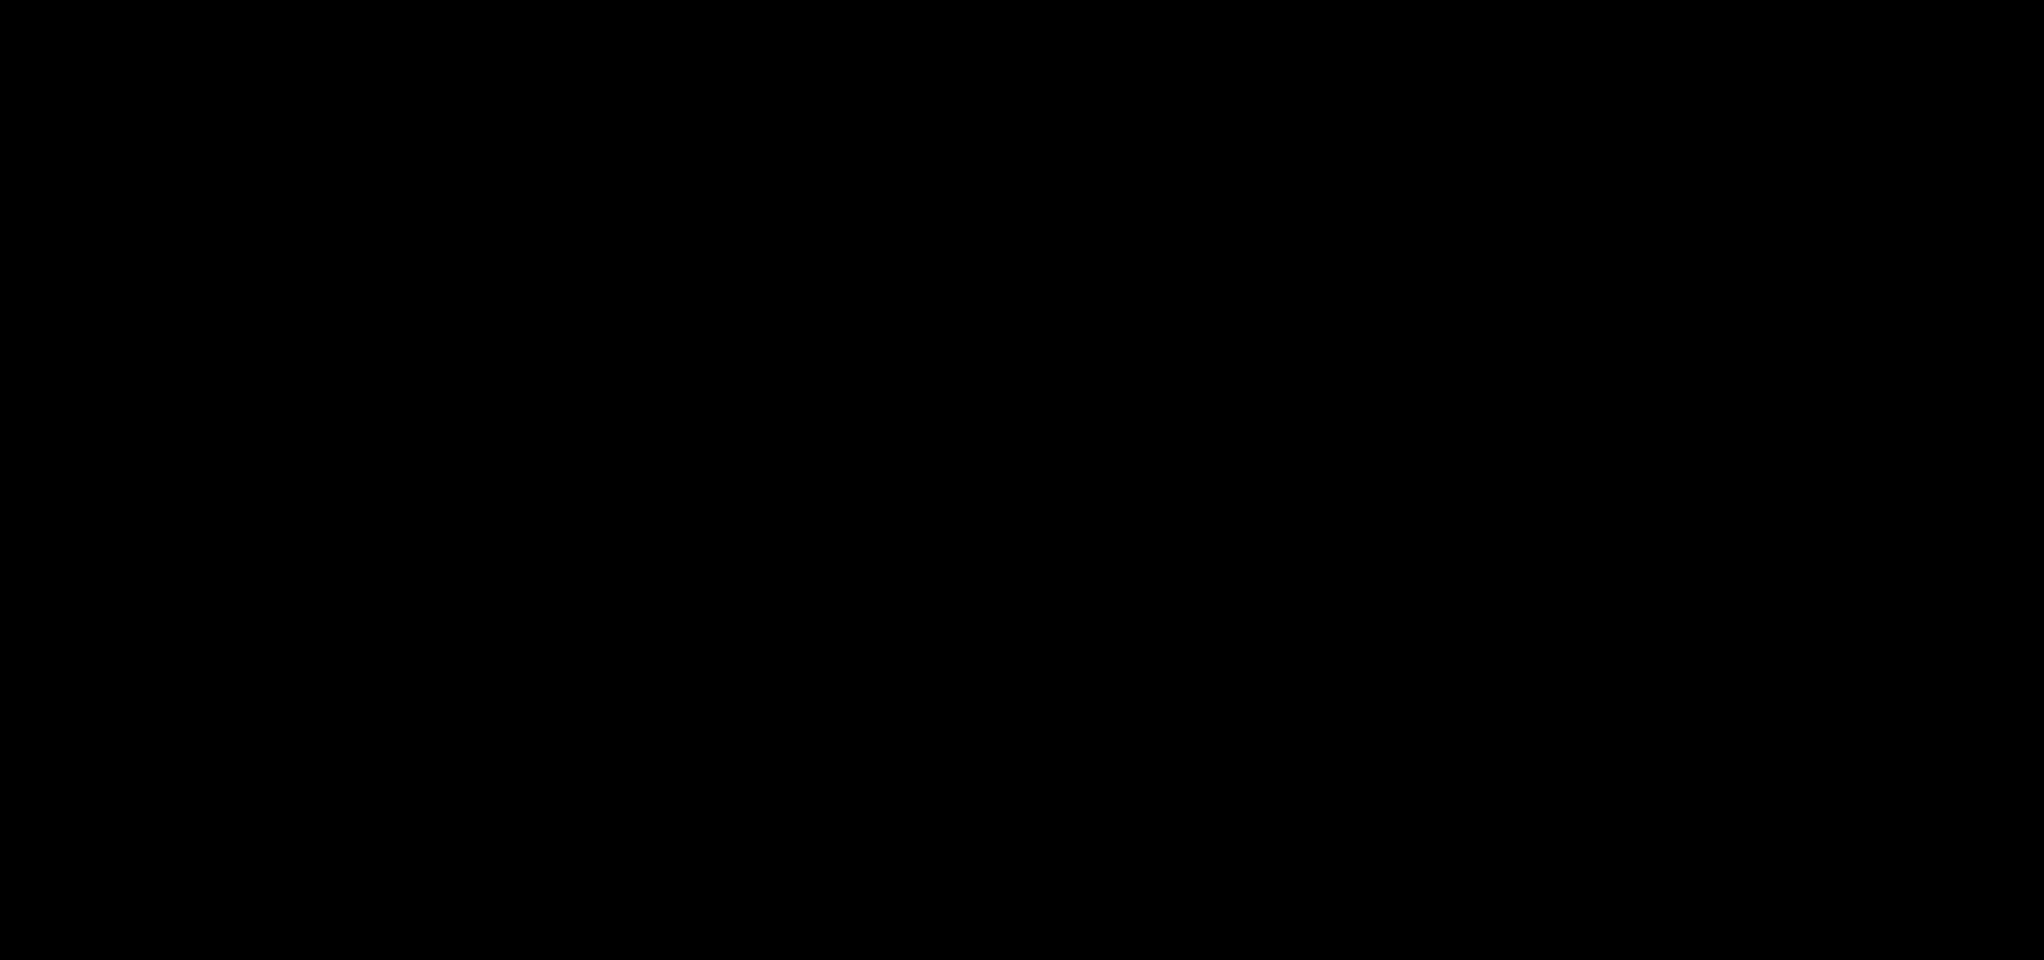 N-(4-((2-Amino-9H-purin-6-yloxy)methyl)benzyl)-2-((2,2,2-trifluoroacetamido)methyl)isonicotinamide